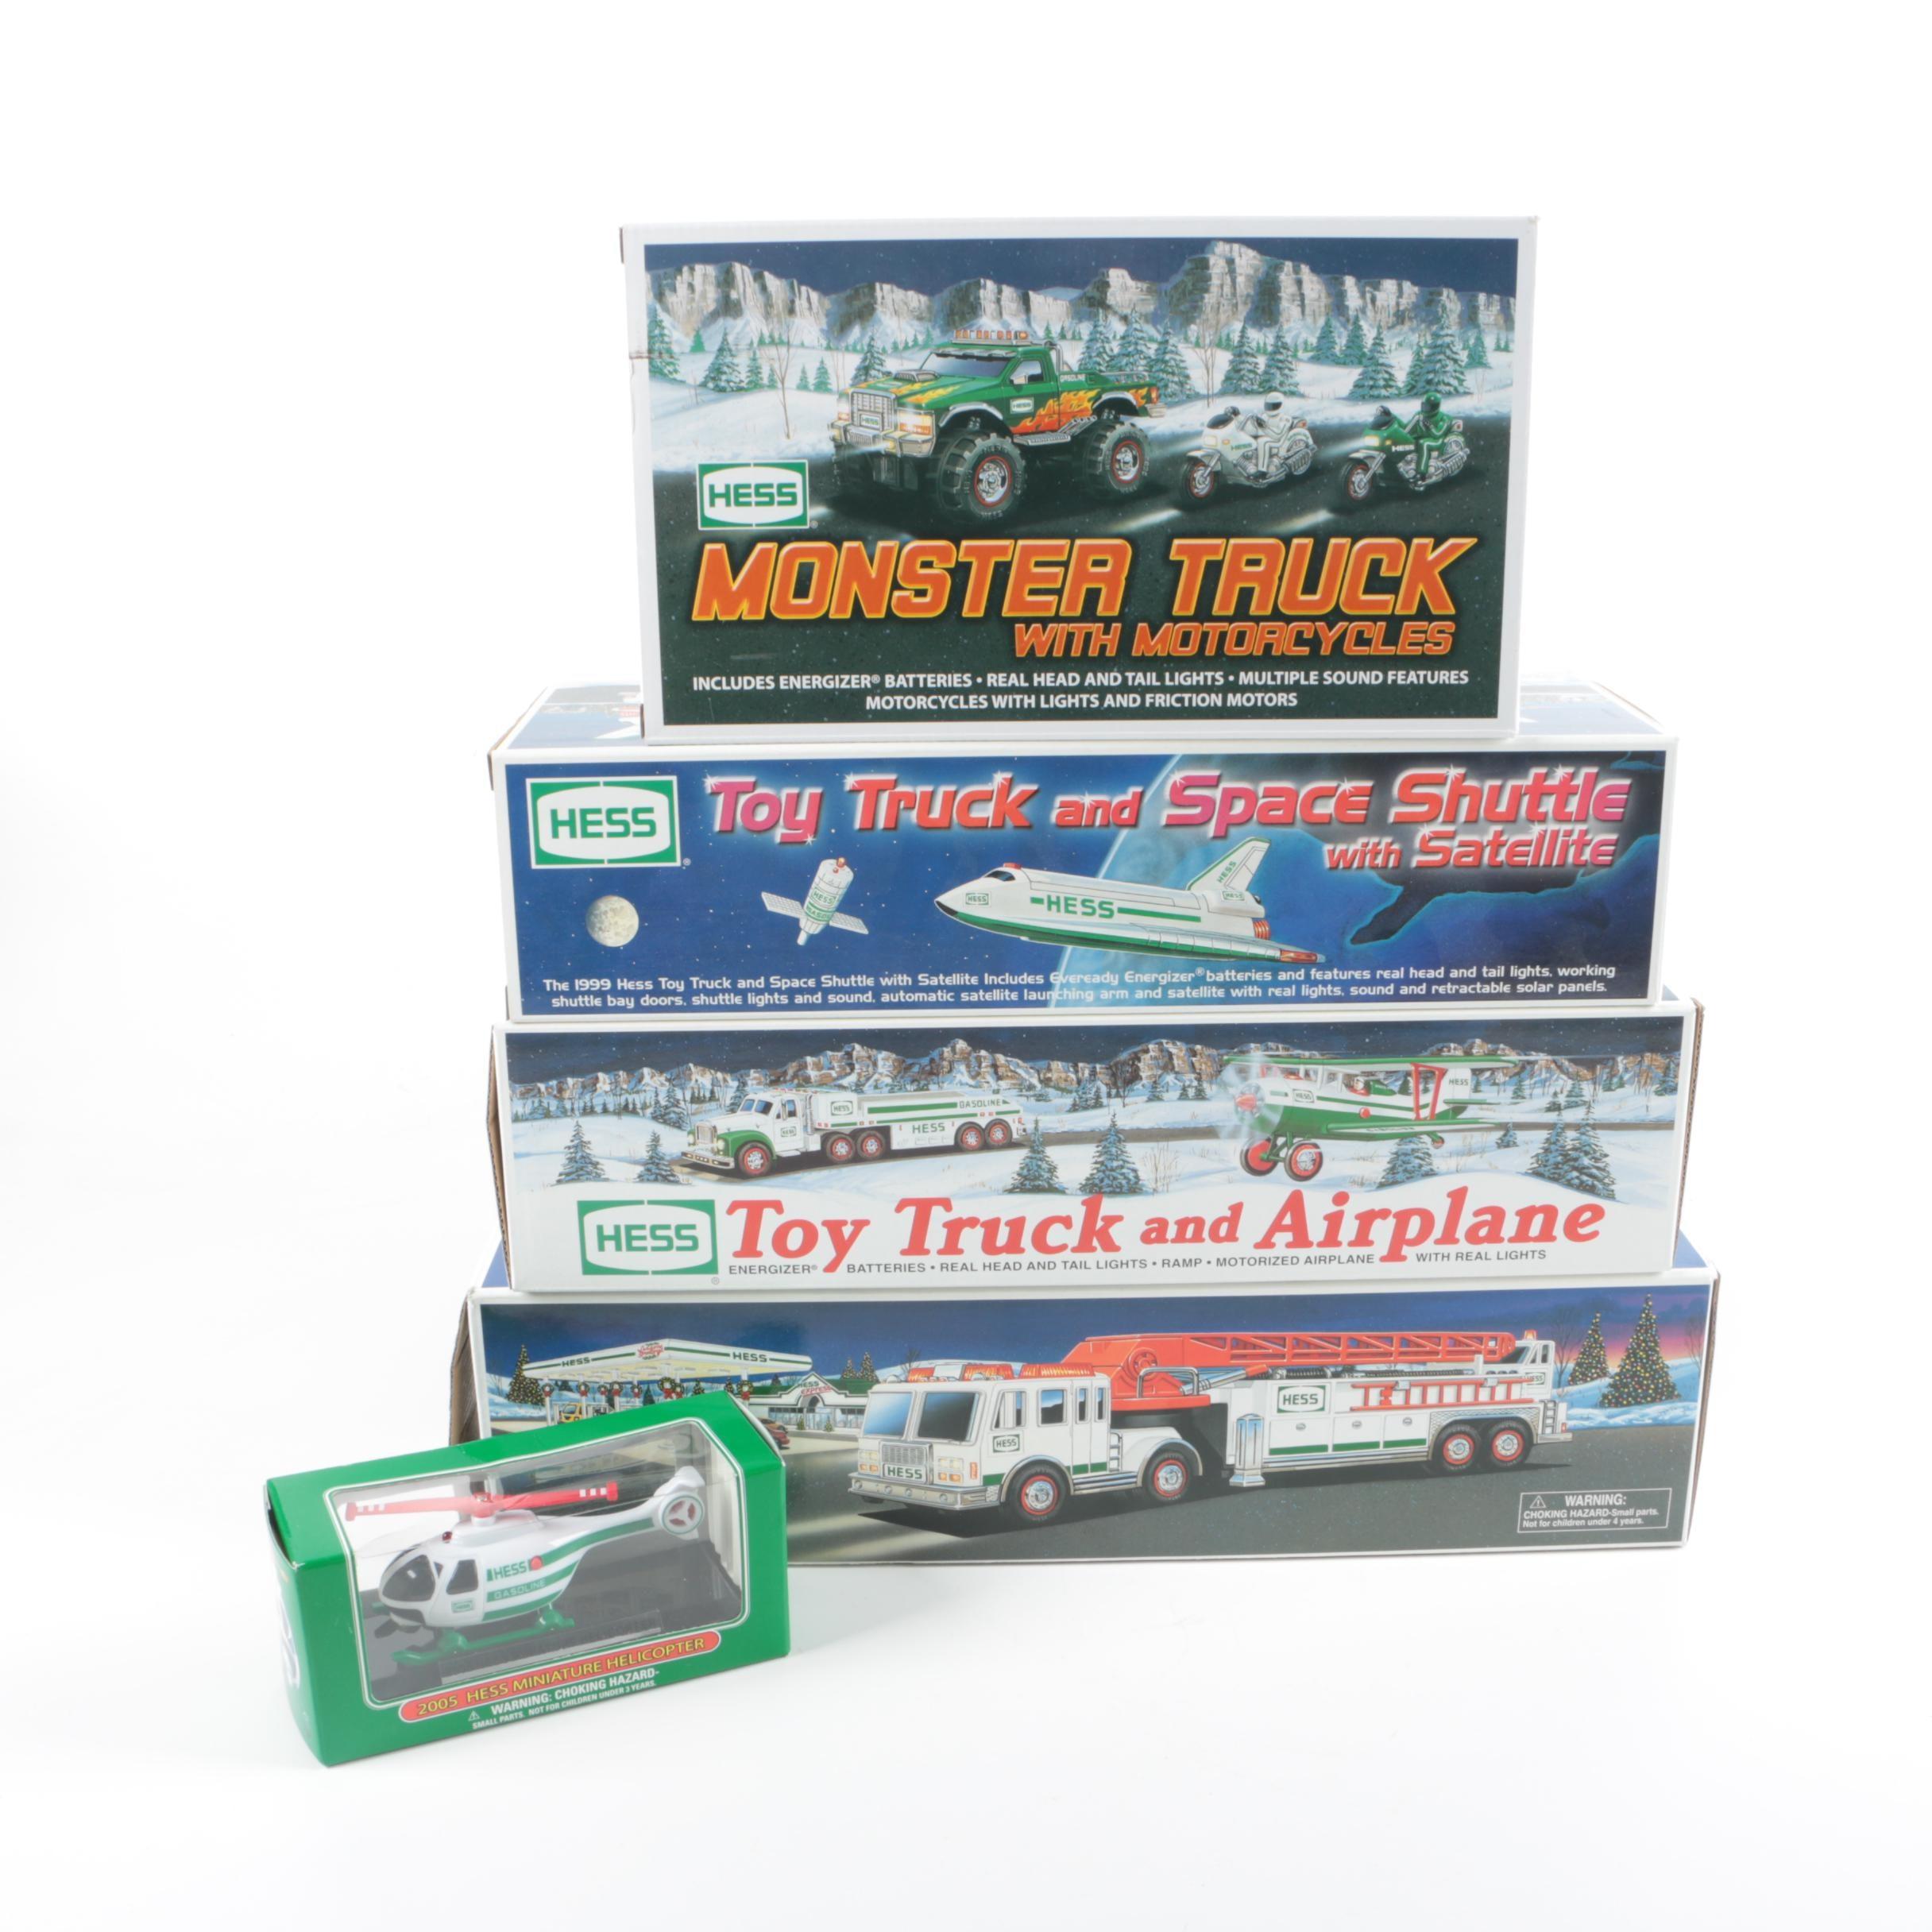 Five Hess Vehicles